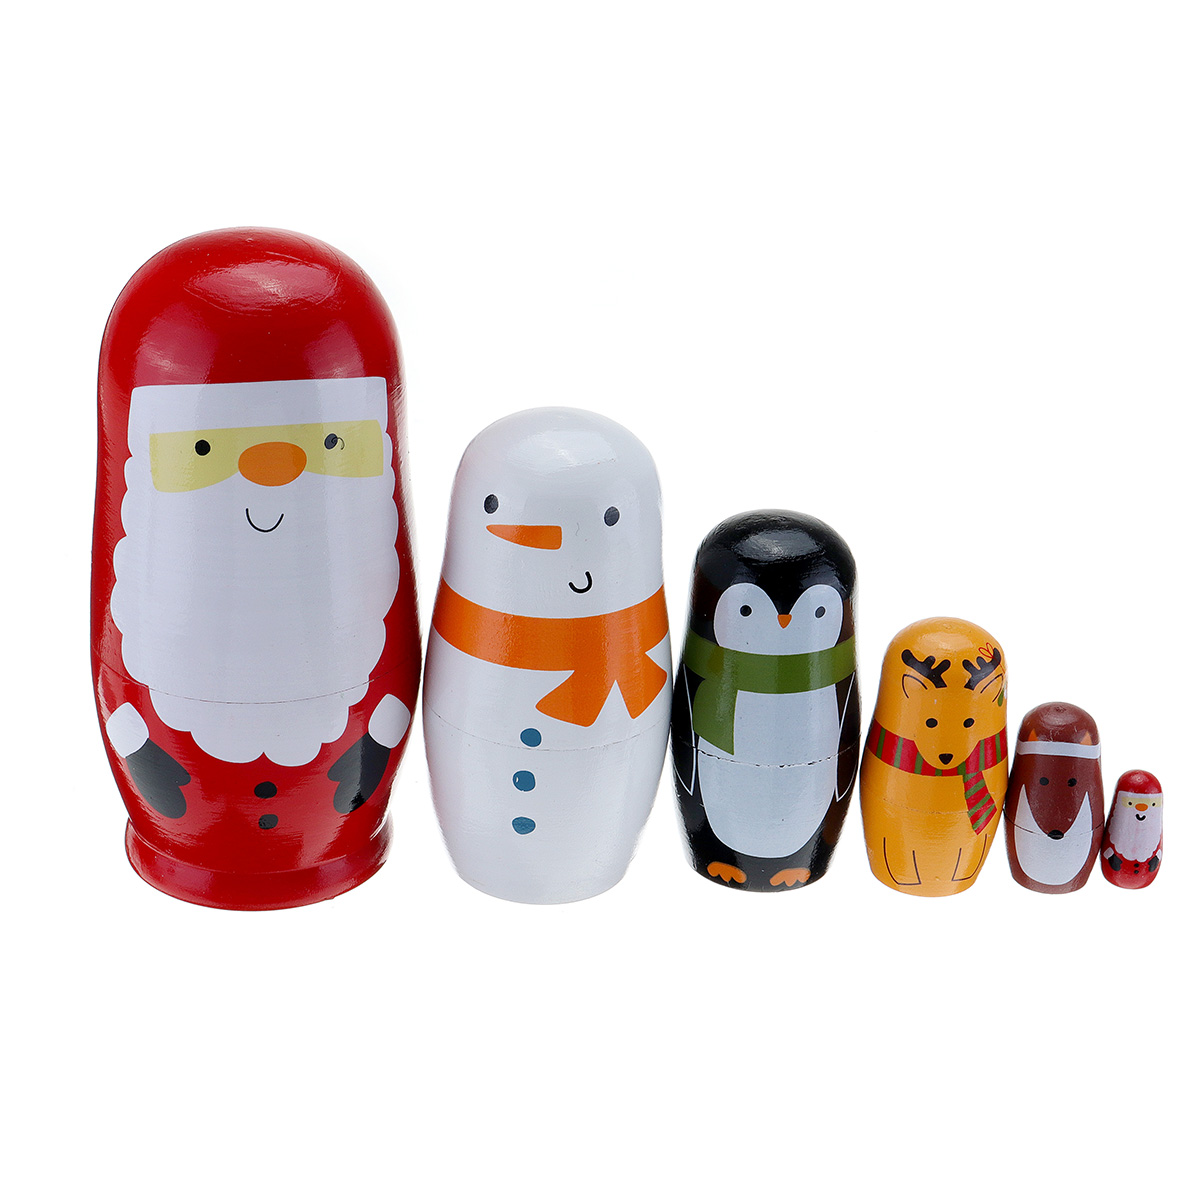 Wooden Animal Russian Doll Matryoshka Toy Decor Nesting Dolls Set Kids Gift S